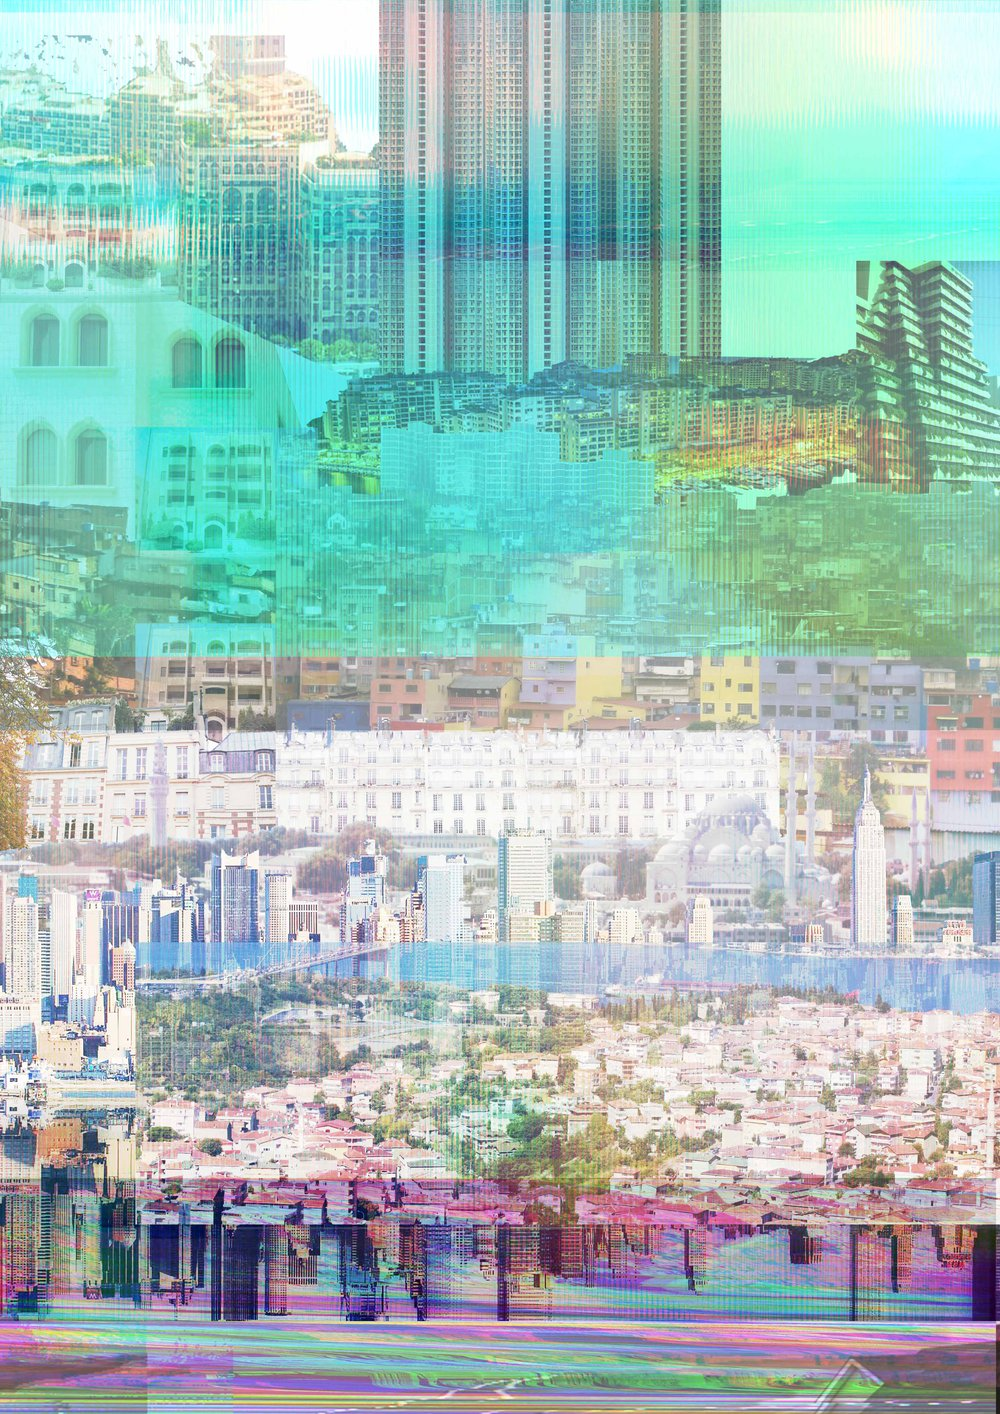 The Global City Glitch